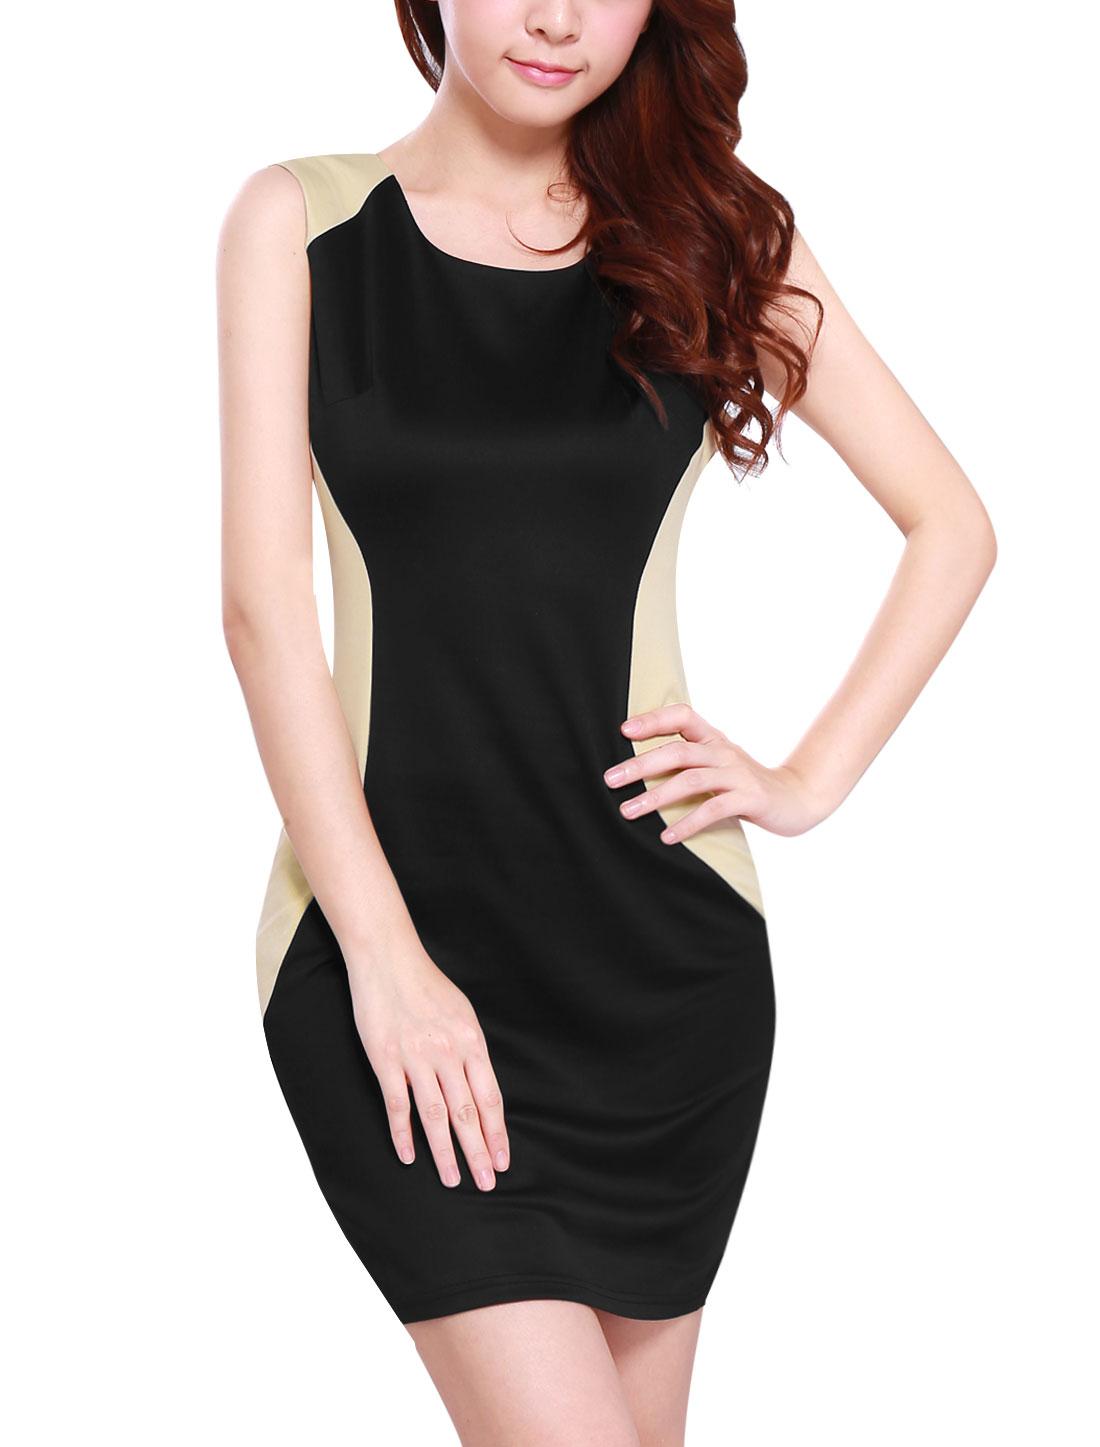 Lady Elegant Colorblock Concealed Zipper Side Sheath Dress Black S